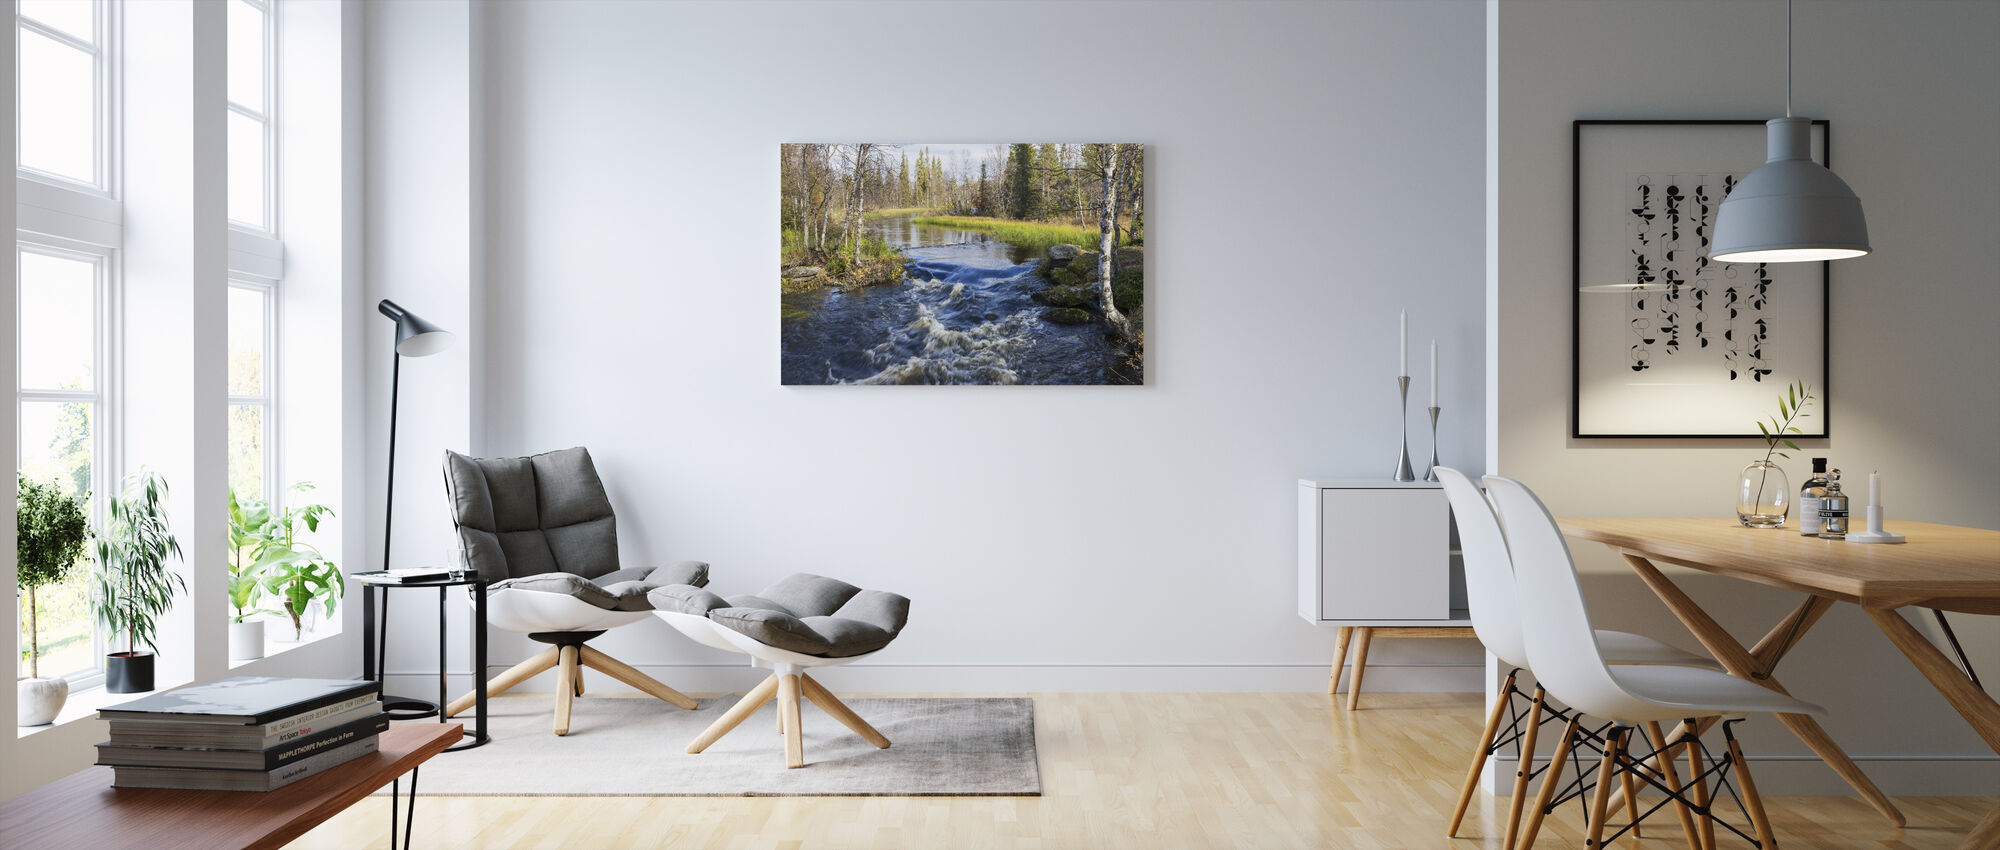 Lappland - Canvastavla - Vardagsrum